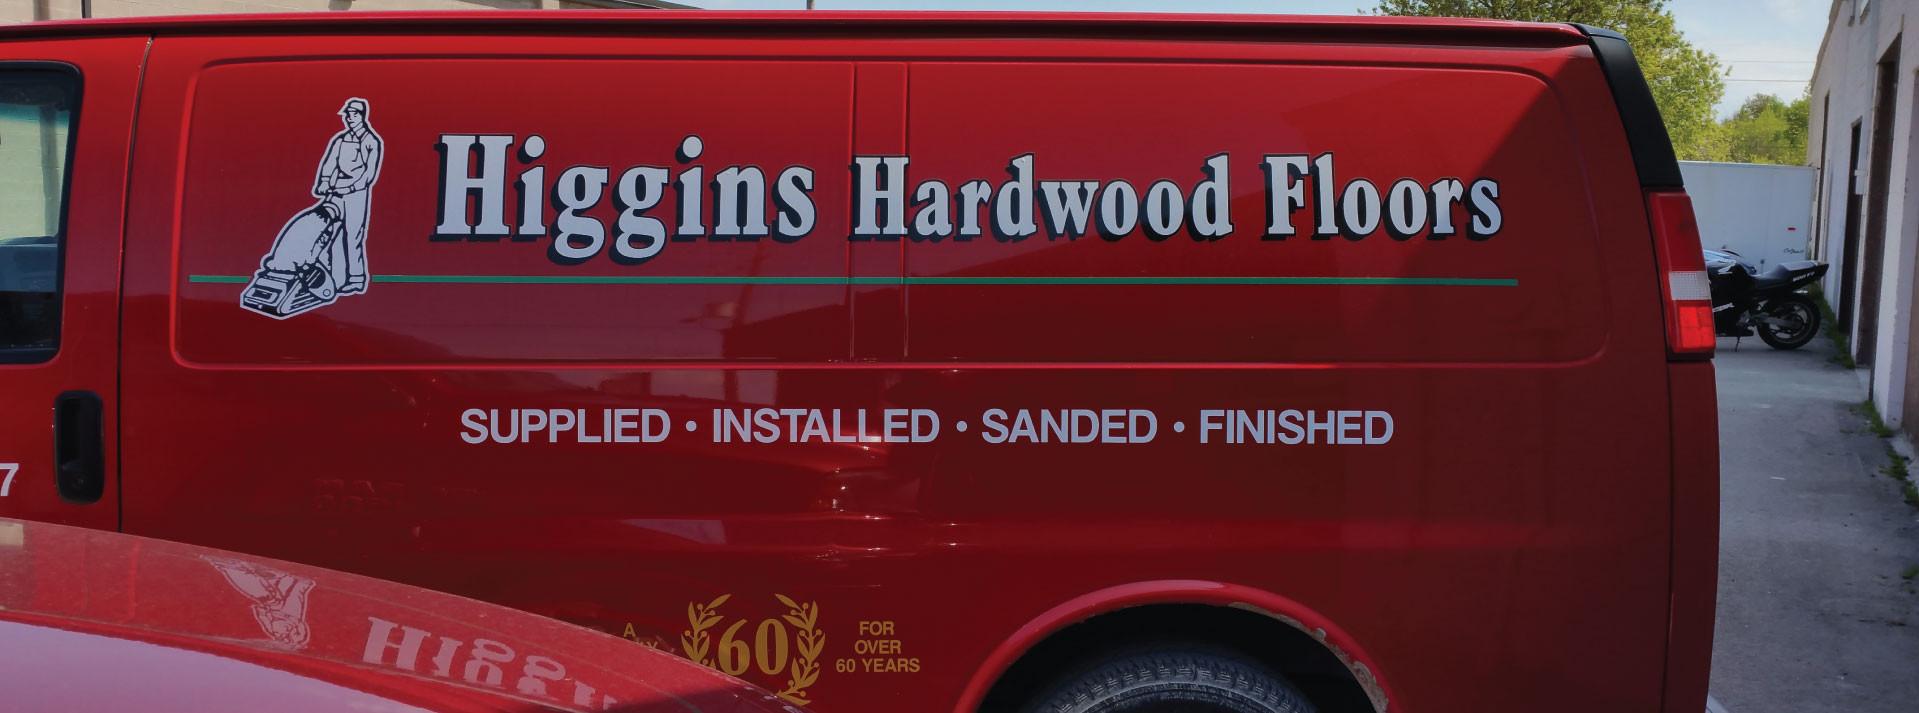 hardwood flooring pickering ontario of higgins hardwood flooring in peterborough oshawa lindsay ajax for office hours